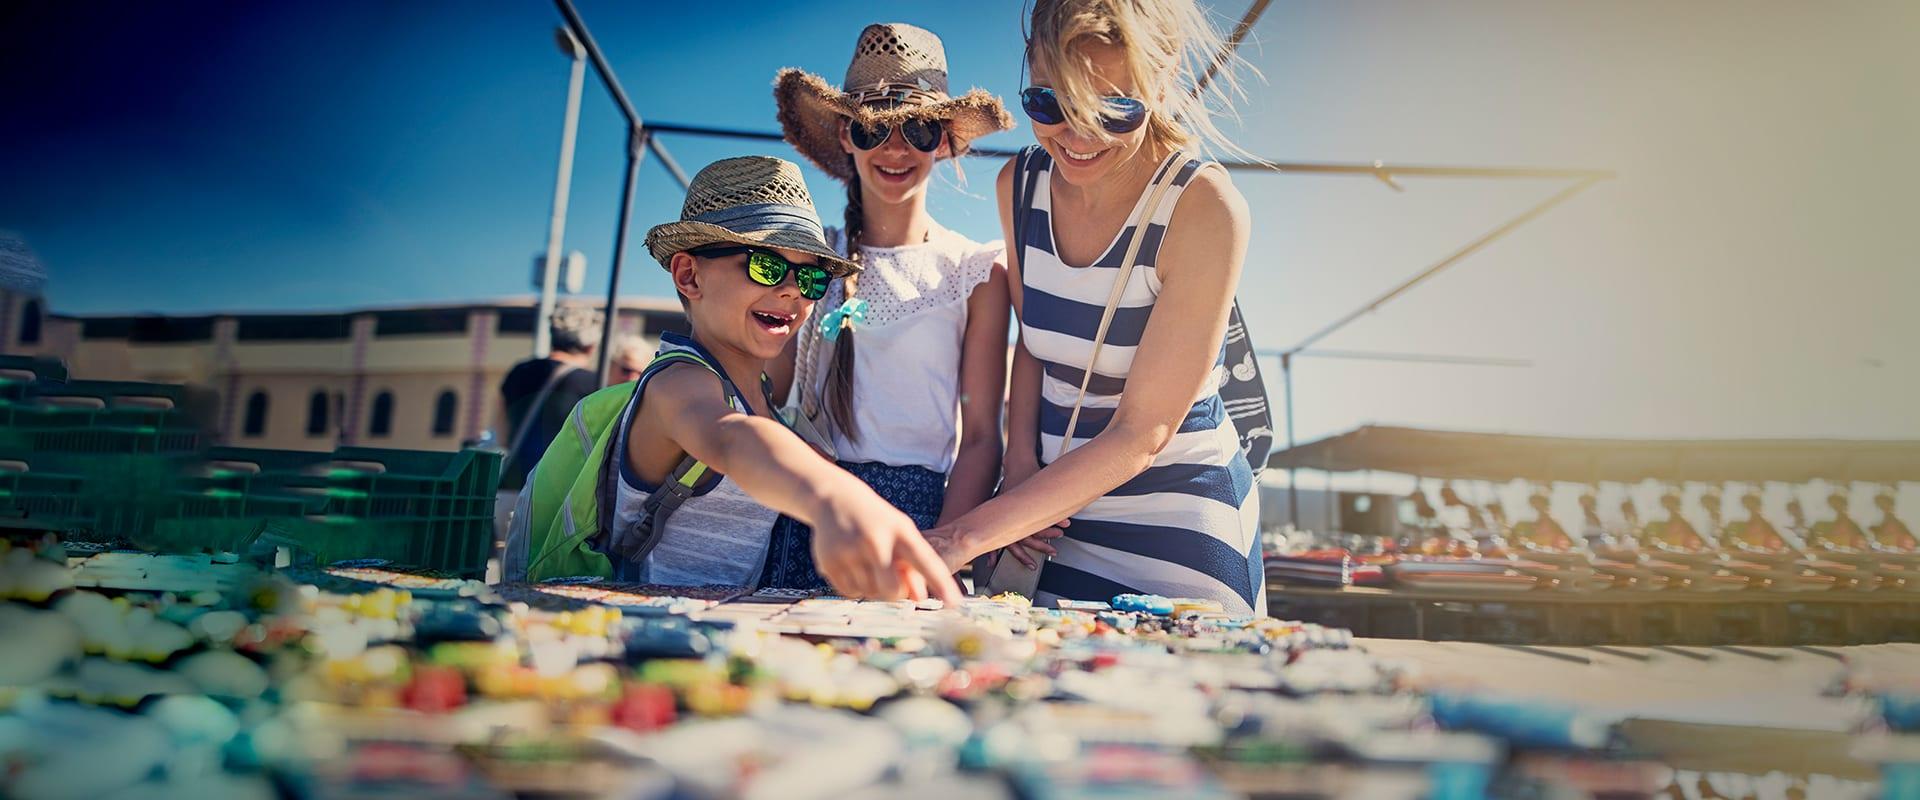 Family buying souvenirs on flea market